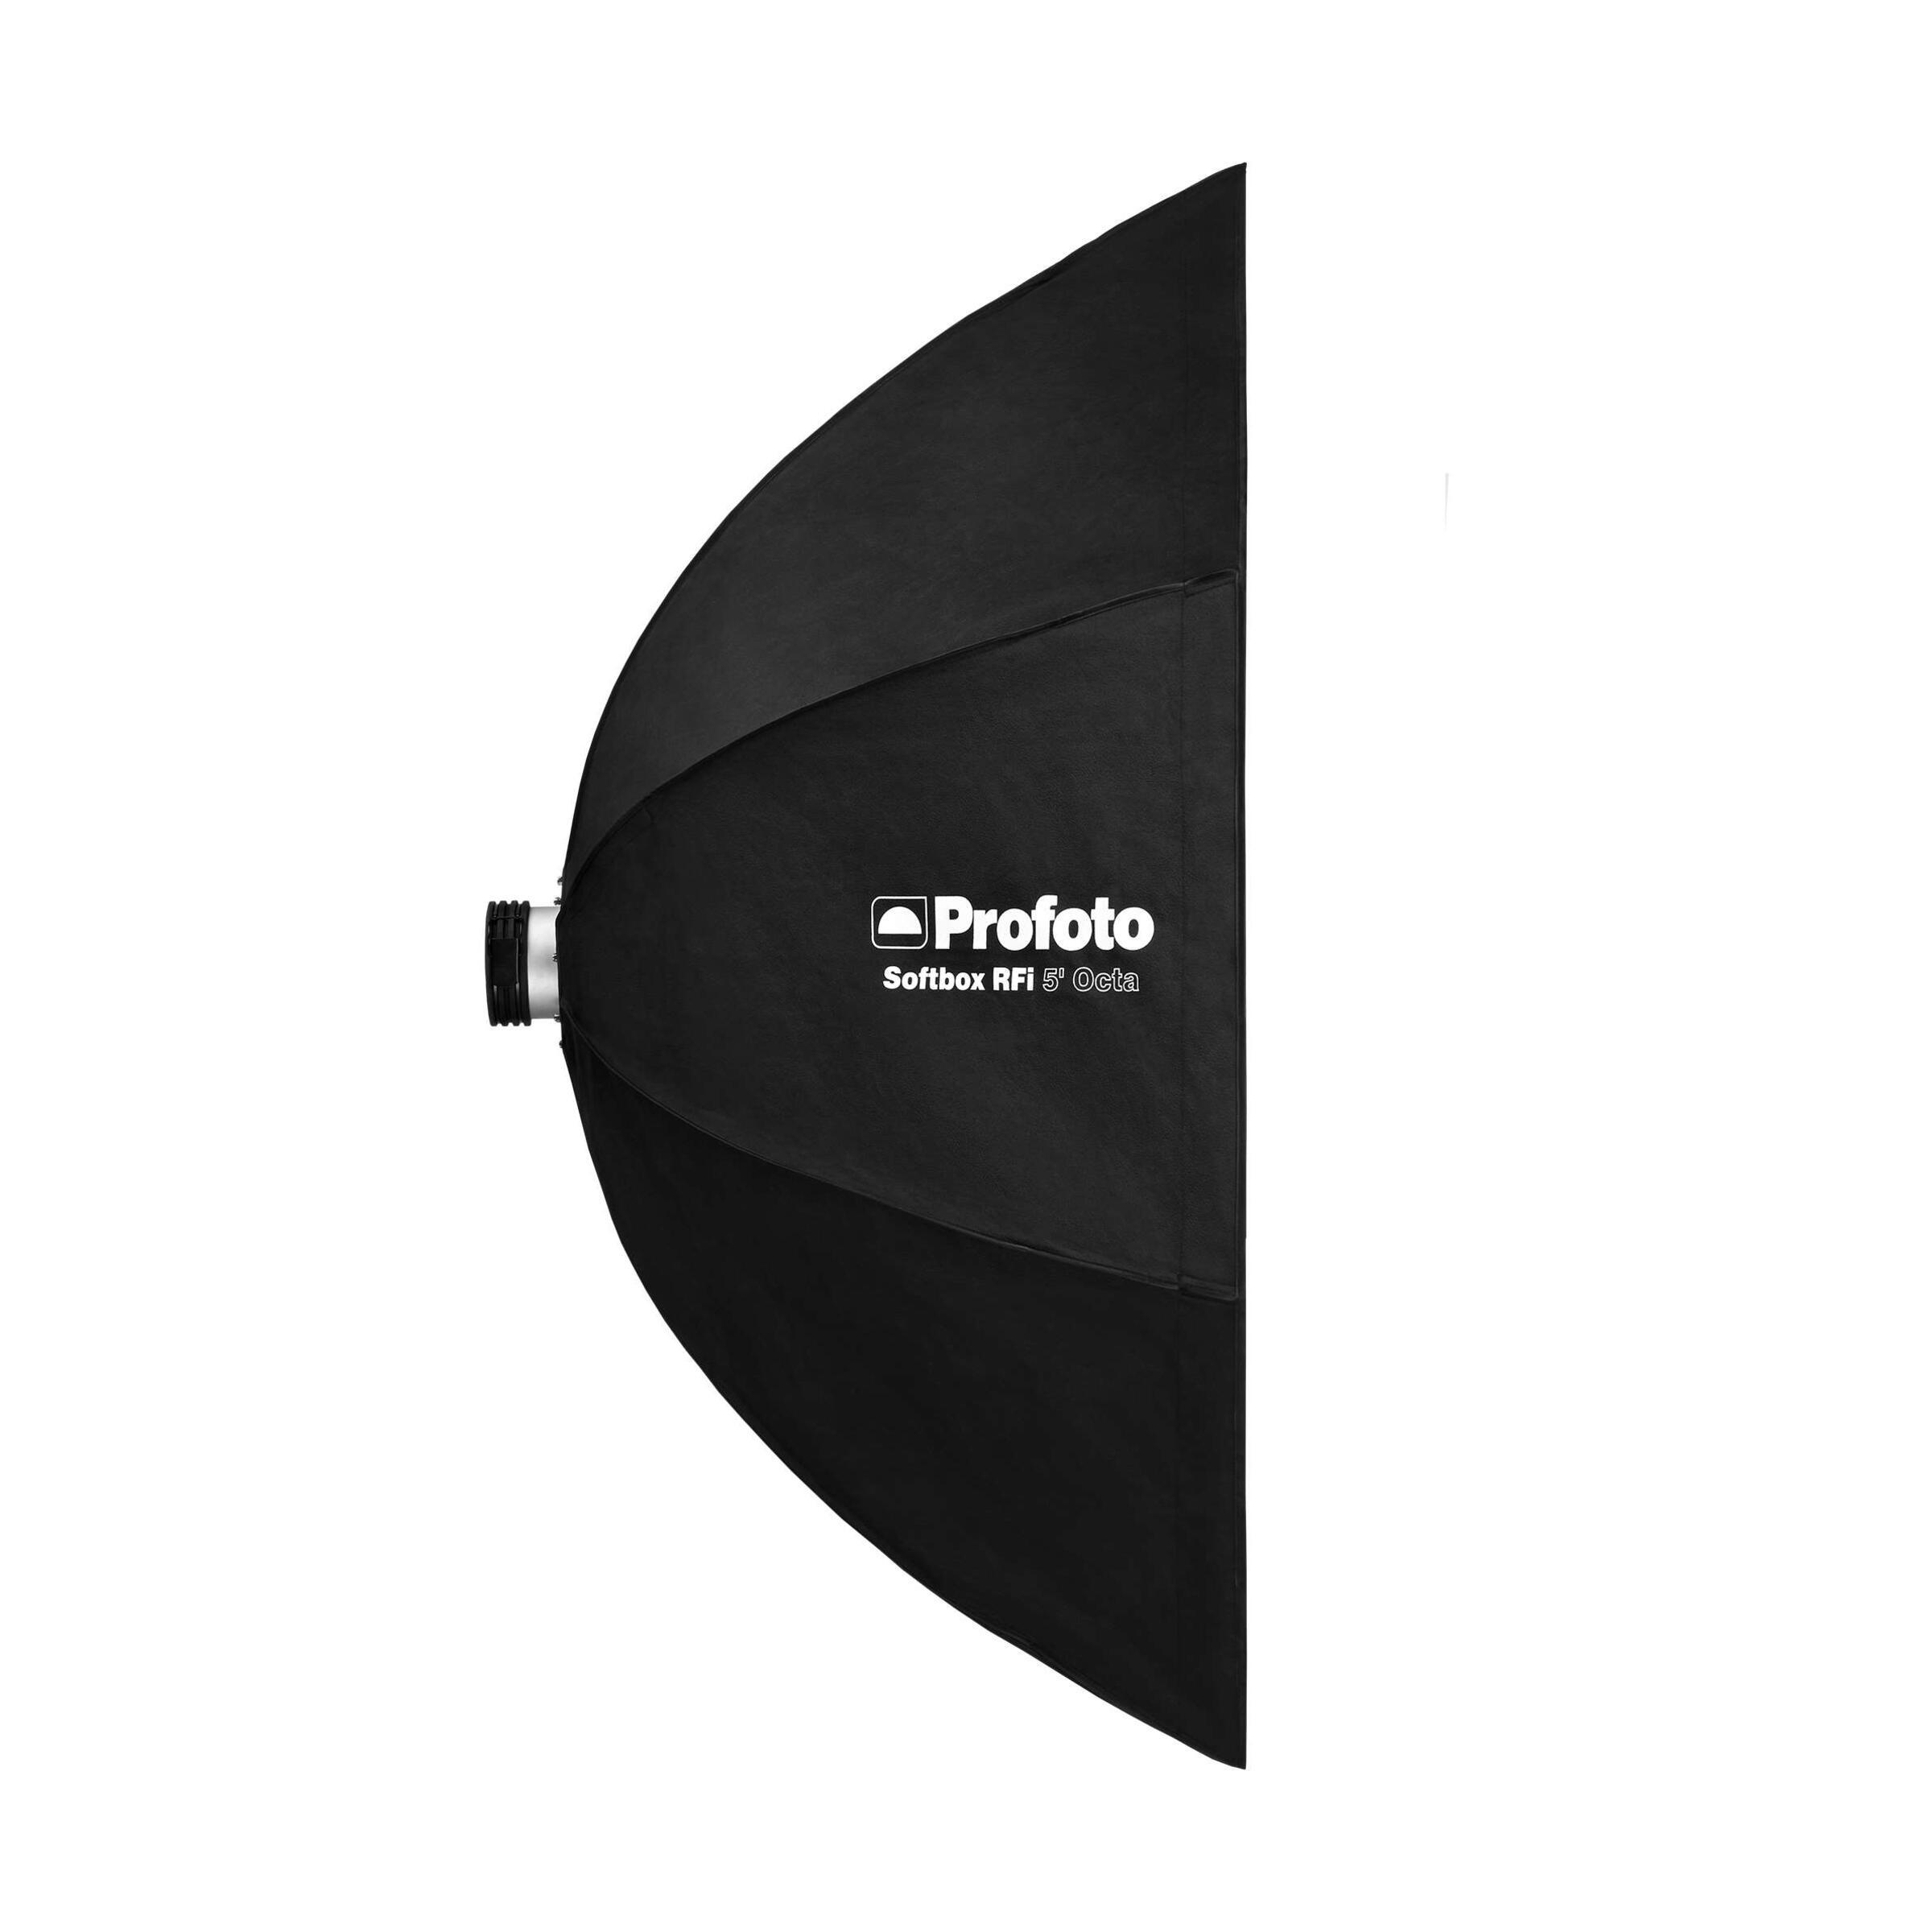 Profoto RFi Softbox 5' Octa (150 cm)